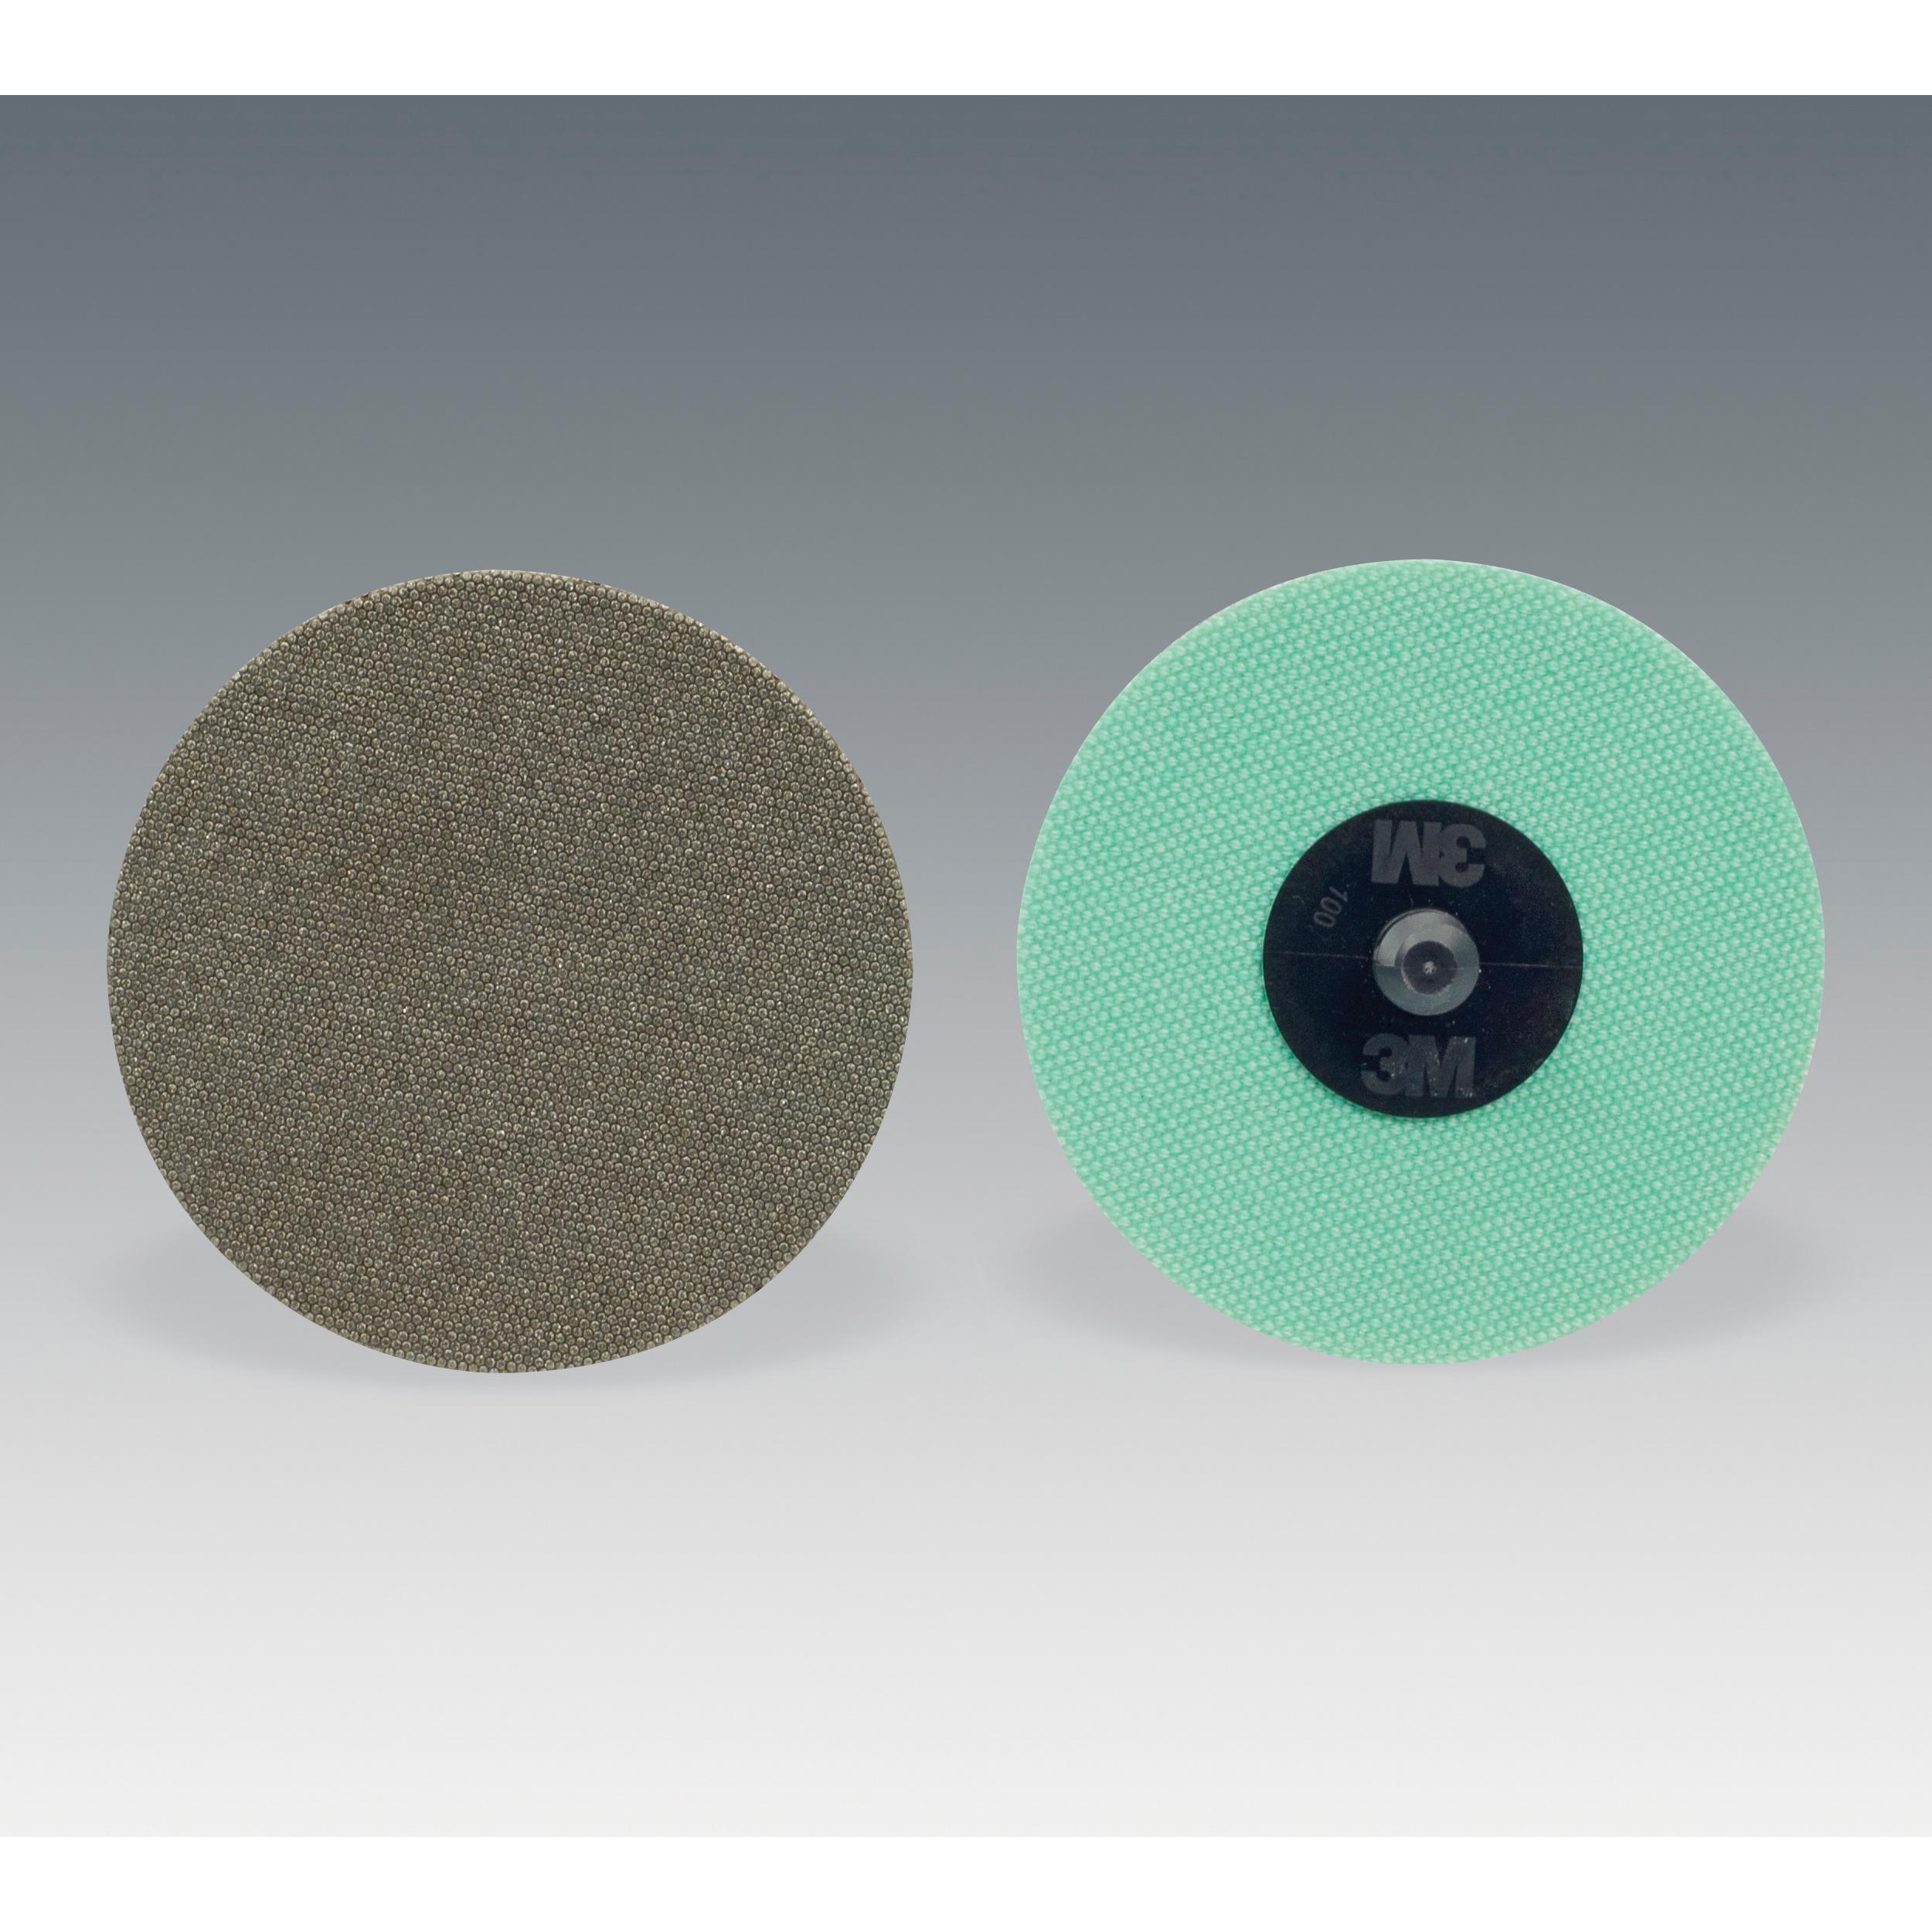 Roloc™ 051144-85254 6234J Type TR Flexible Abrasive Disc, 3 in Dia, No Hole Arbor/Shank, 250 micron Grit, Diamond Abrasive